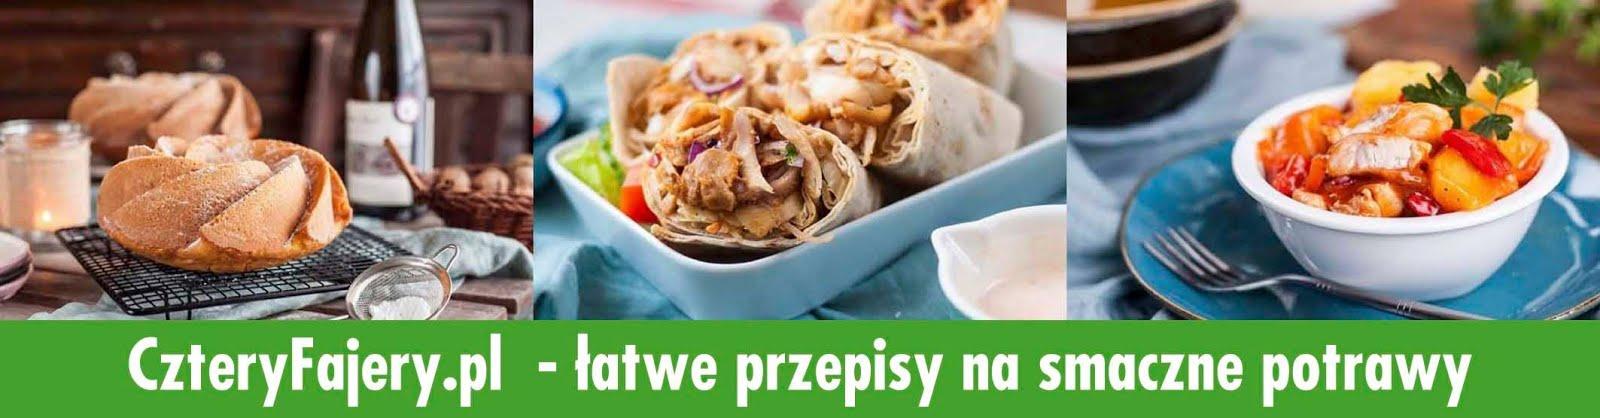 Cztery Fajery - blog kulinarny